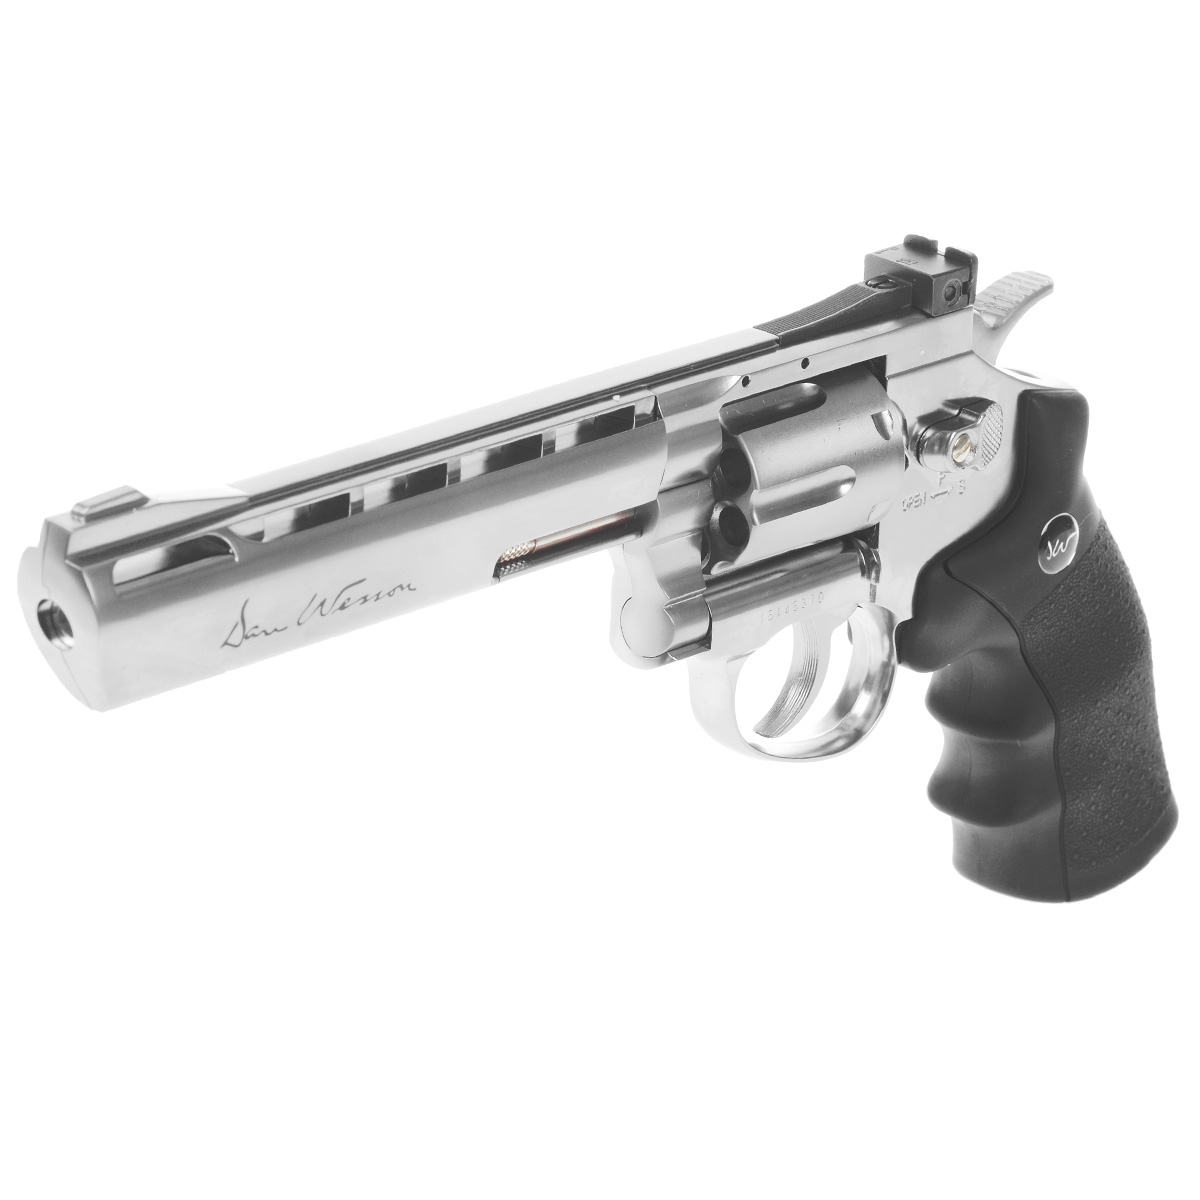 Револьвер пневматический пулевой ASG Dan Wesson 6 Silver, калибр 4,5 мм цена